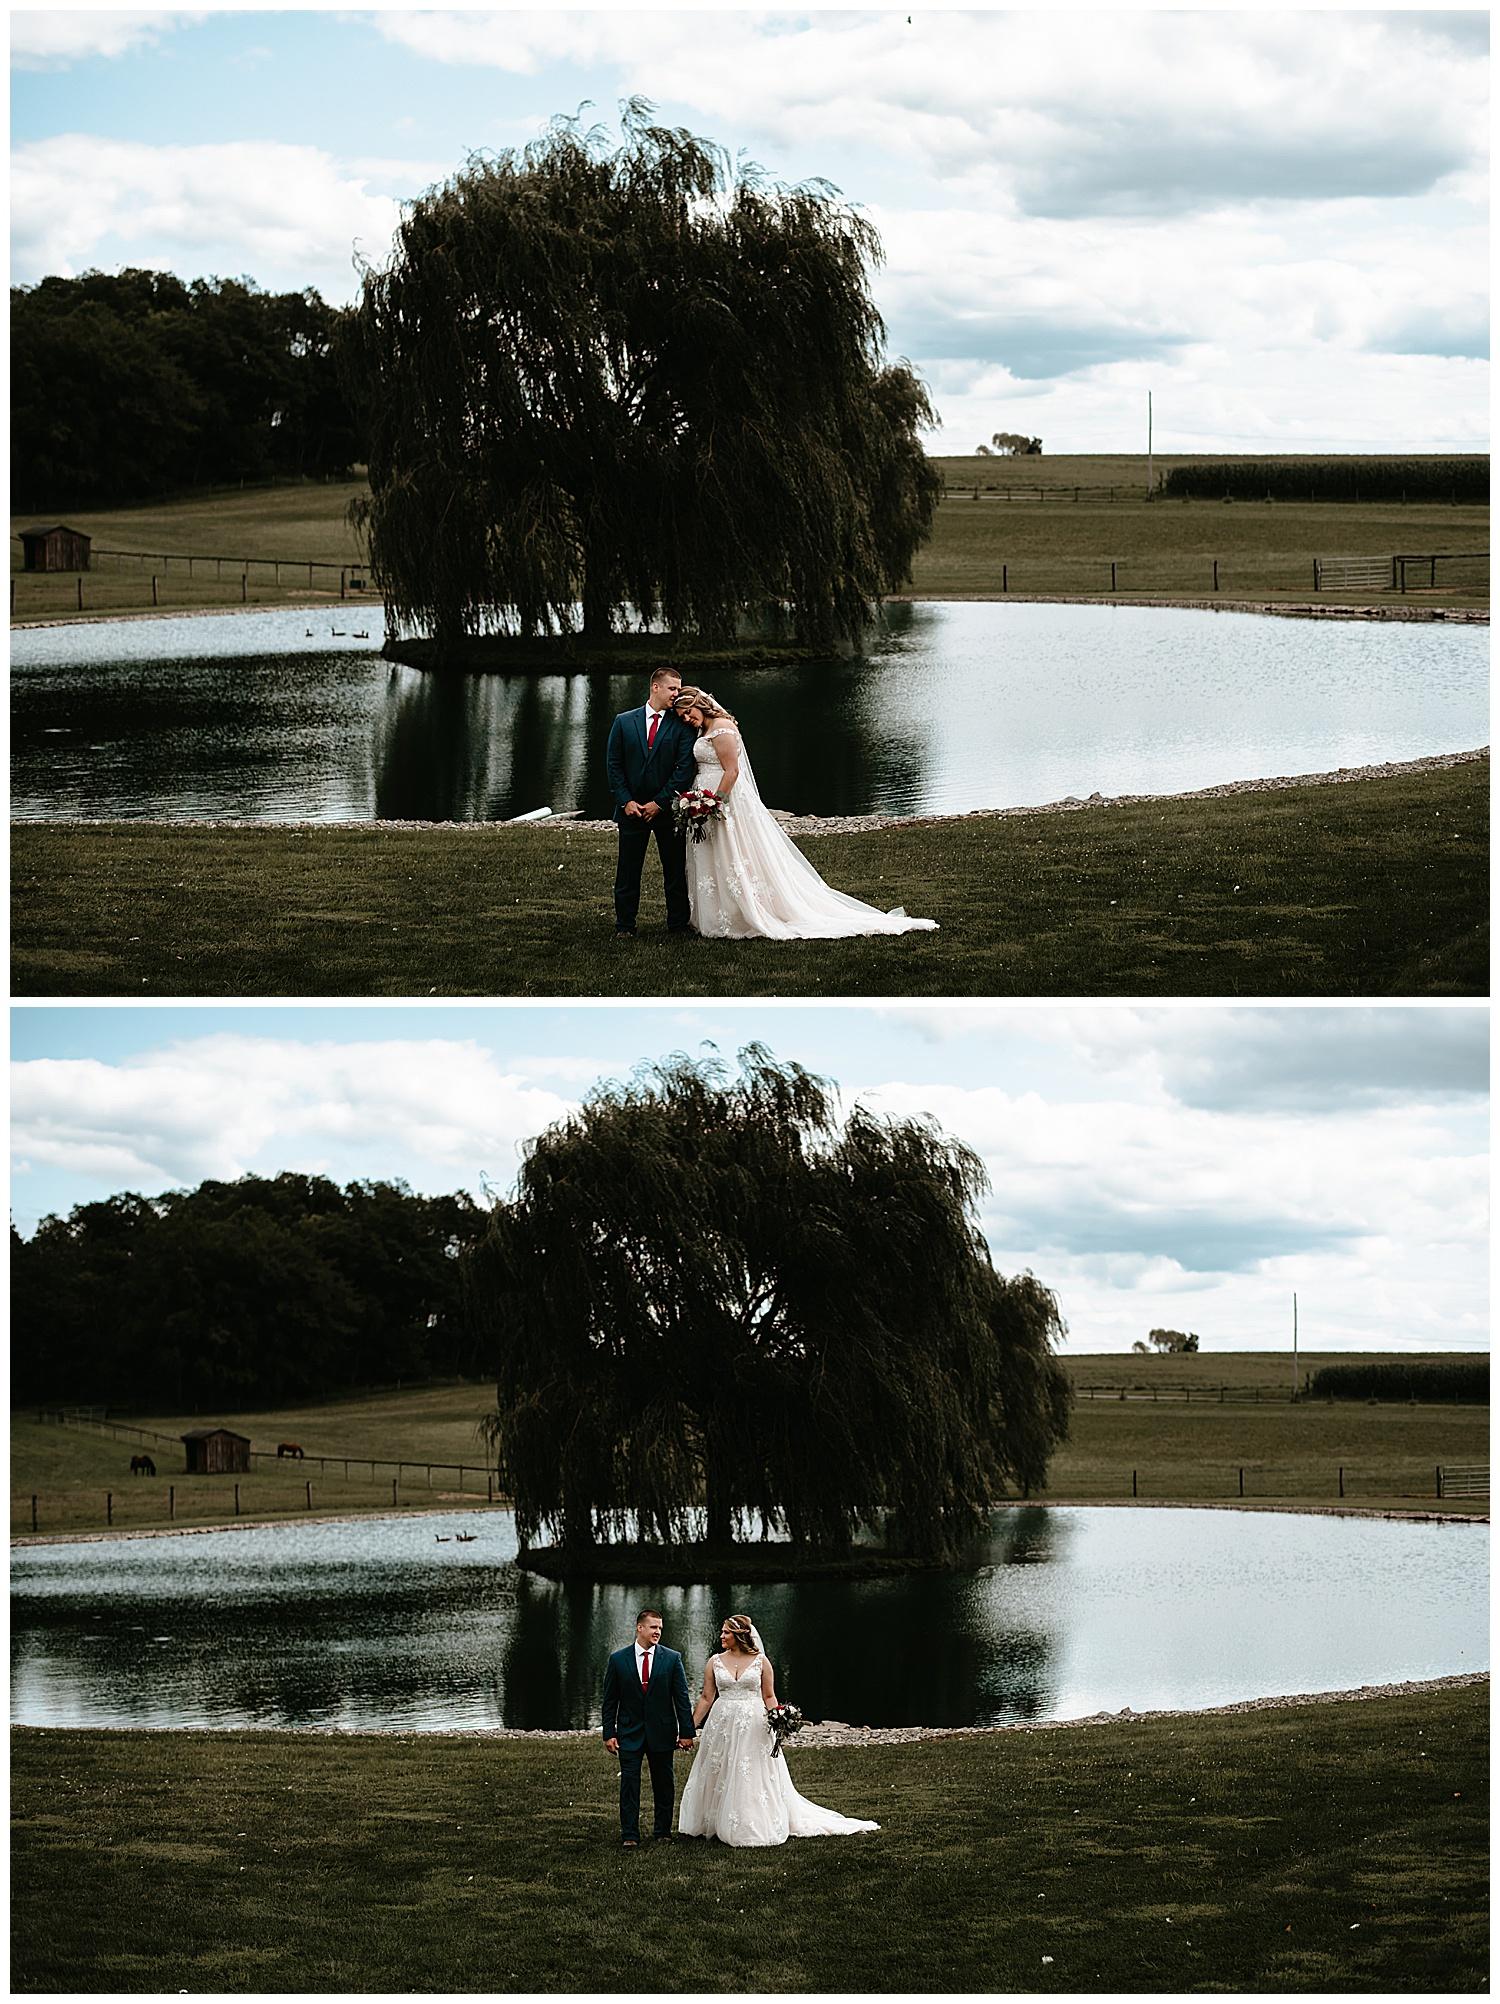 NEPA-Bloomgsburg-Wedding-Photographer-at-The-Barn-at-Greystone-Farms-Watsontown-PA_0027.jpg